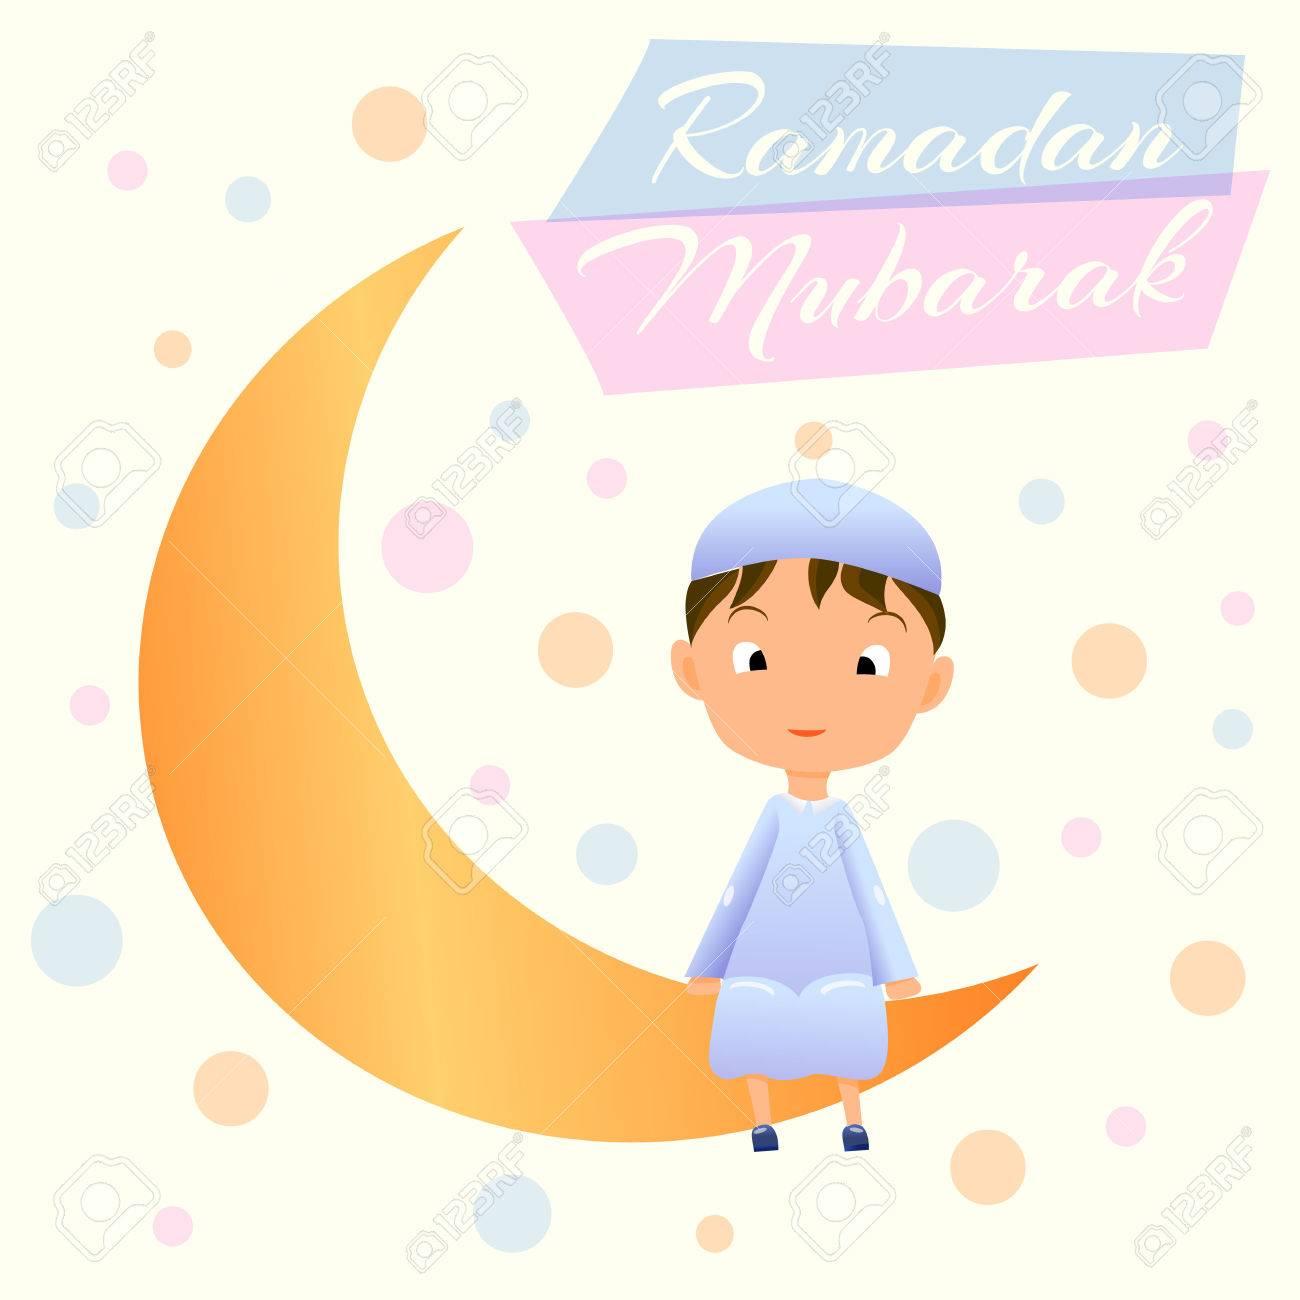 How to greet muslim in ramadan image collections greetings card ramadan kareem greeting card for muslim celebration ramazanhappy m4hsunfo